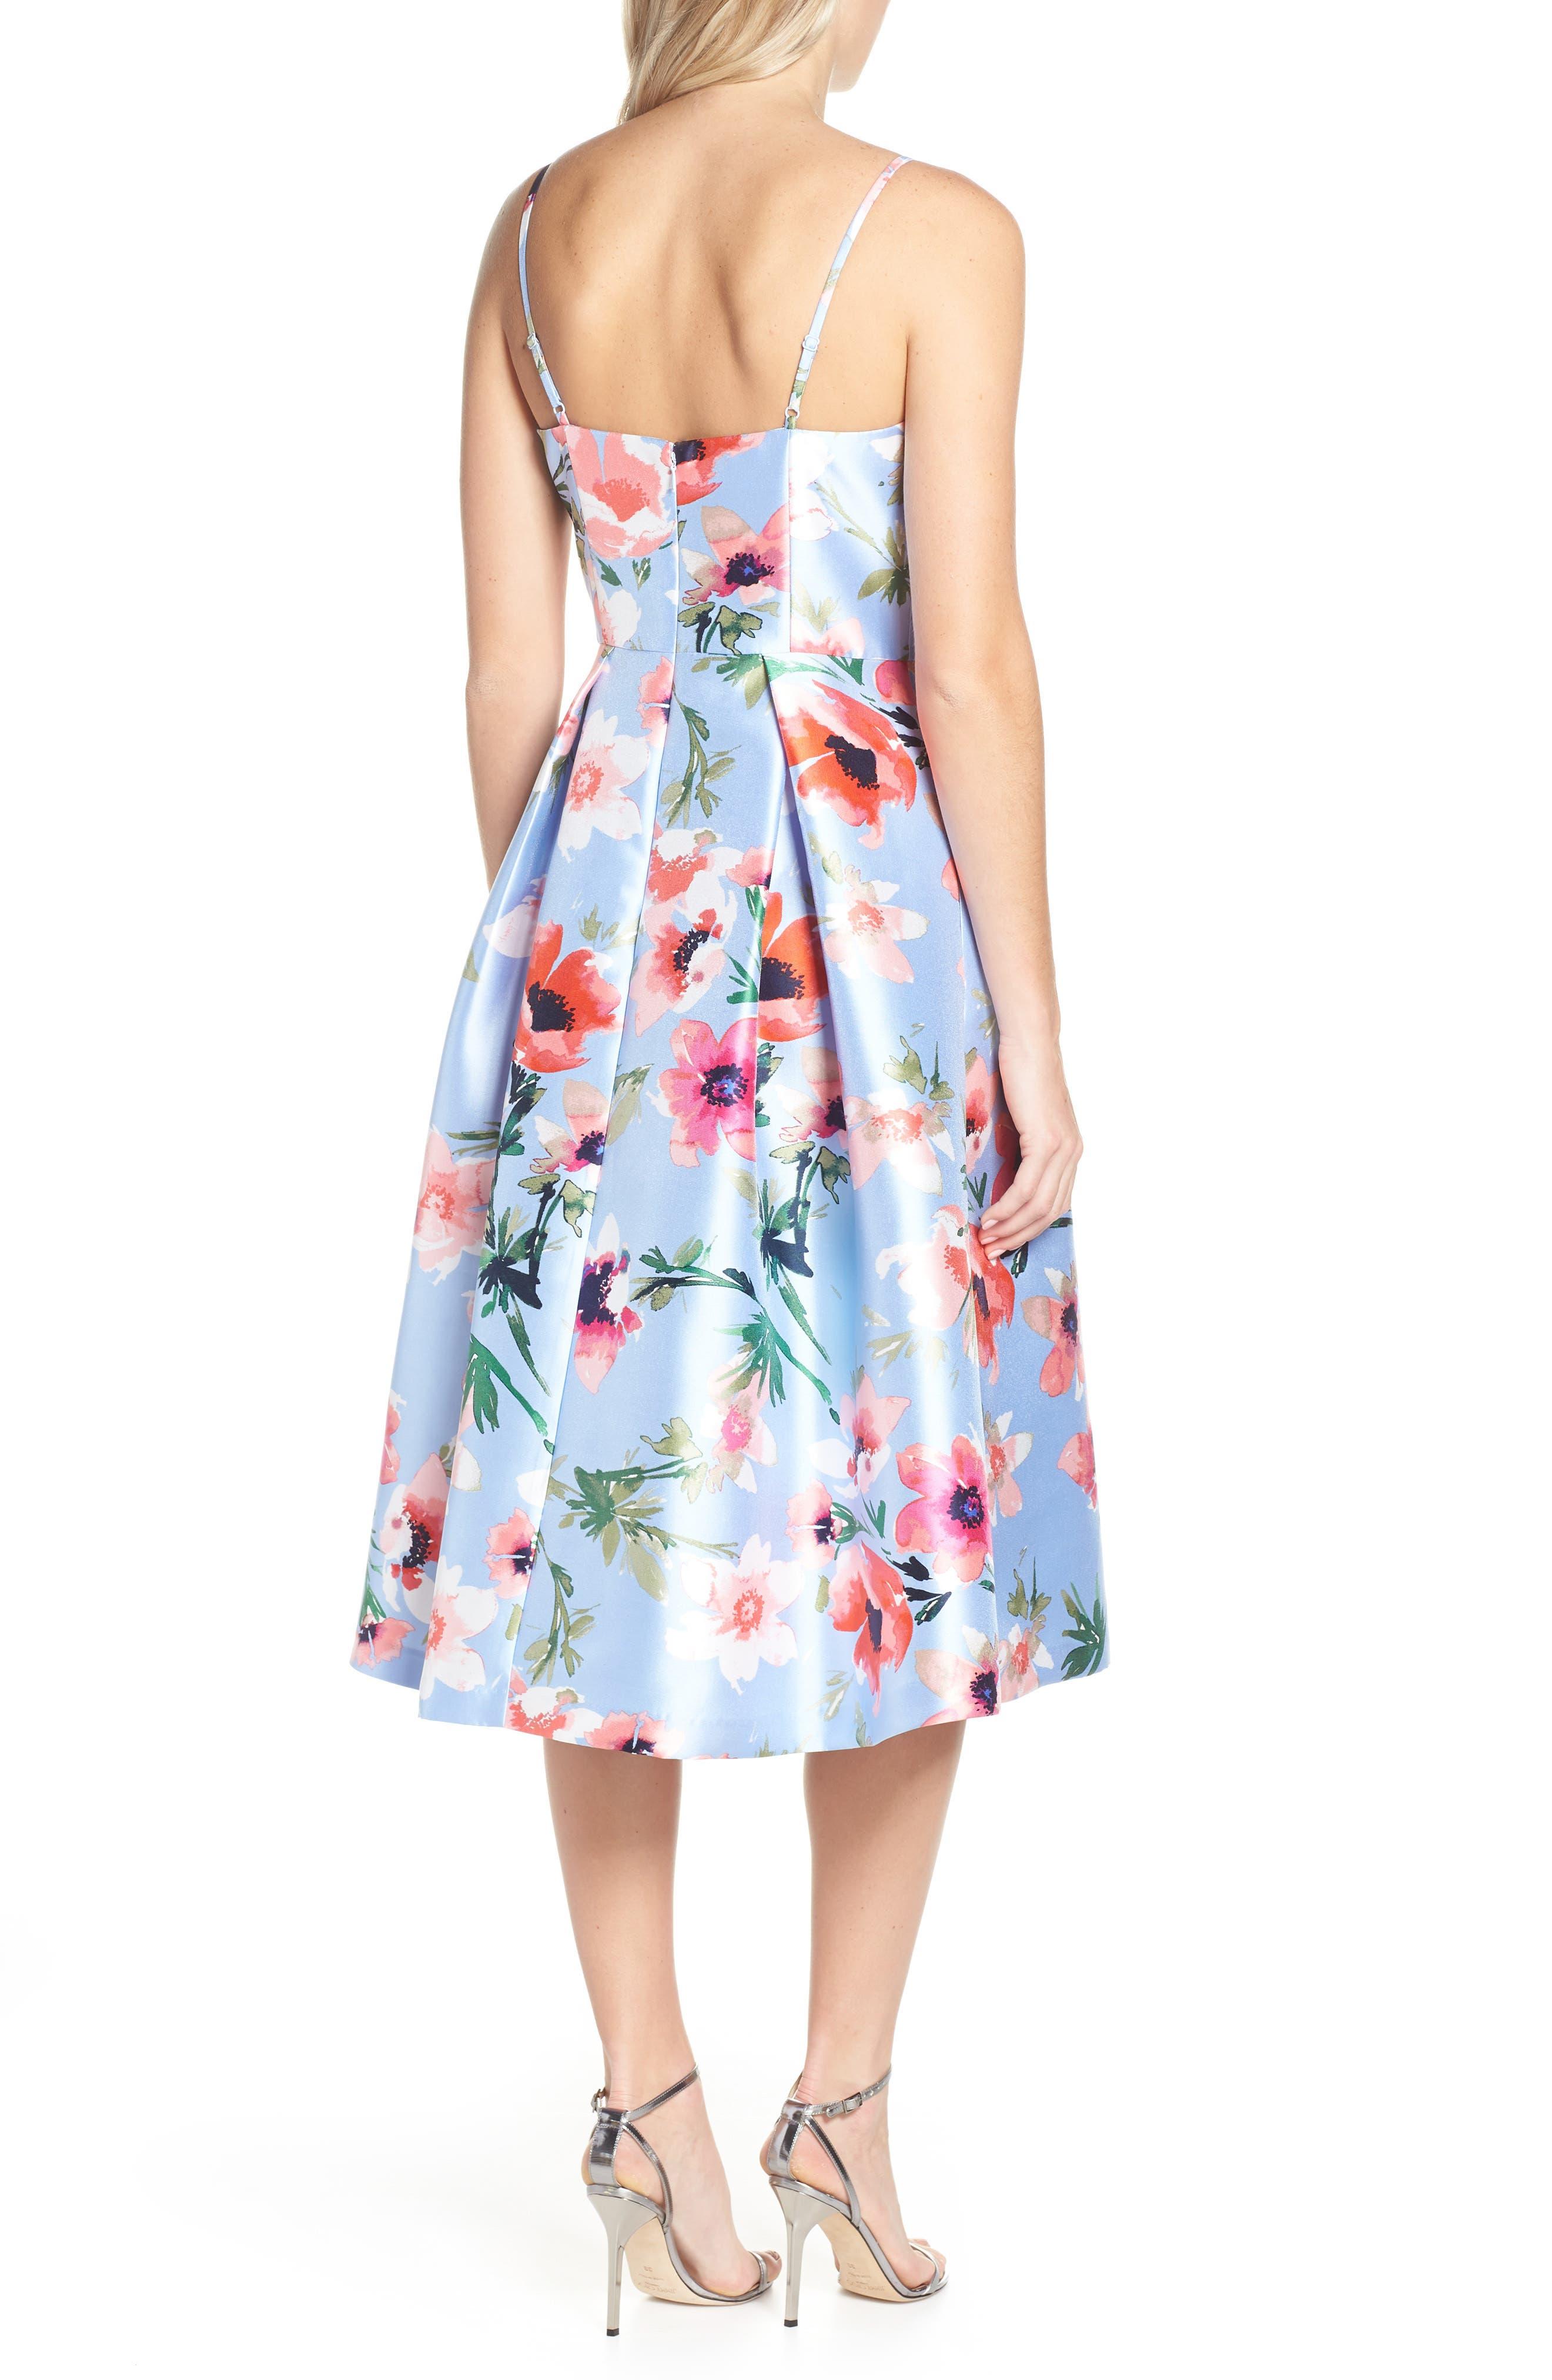 ELIZA J, Floral Print Satin Cocktail Dress, Alternate thumbnail 2, color, BLUE